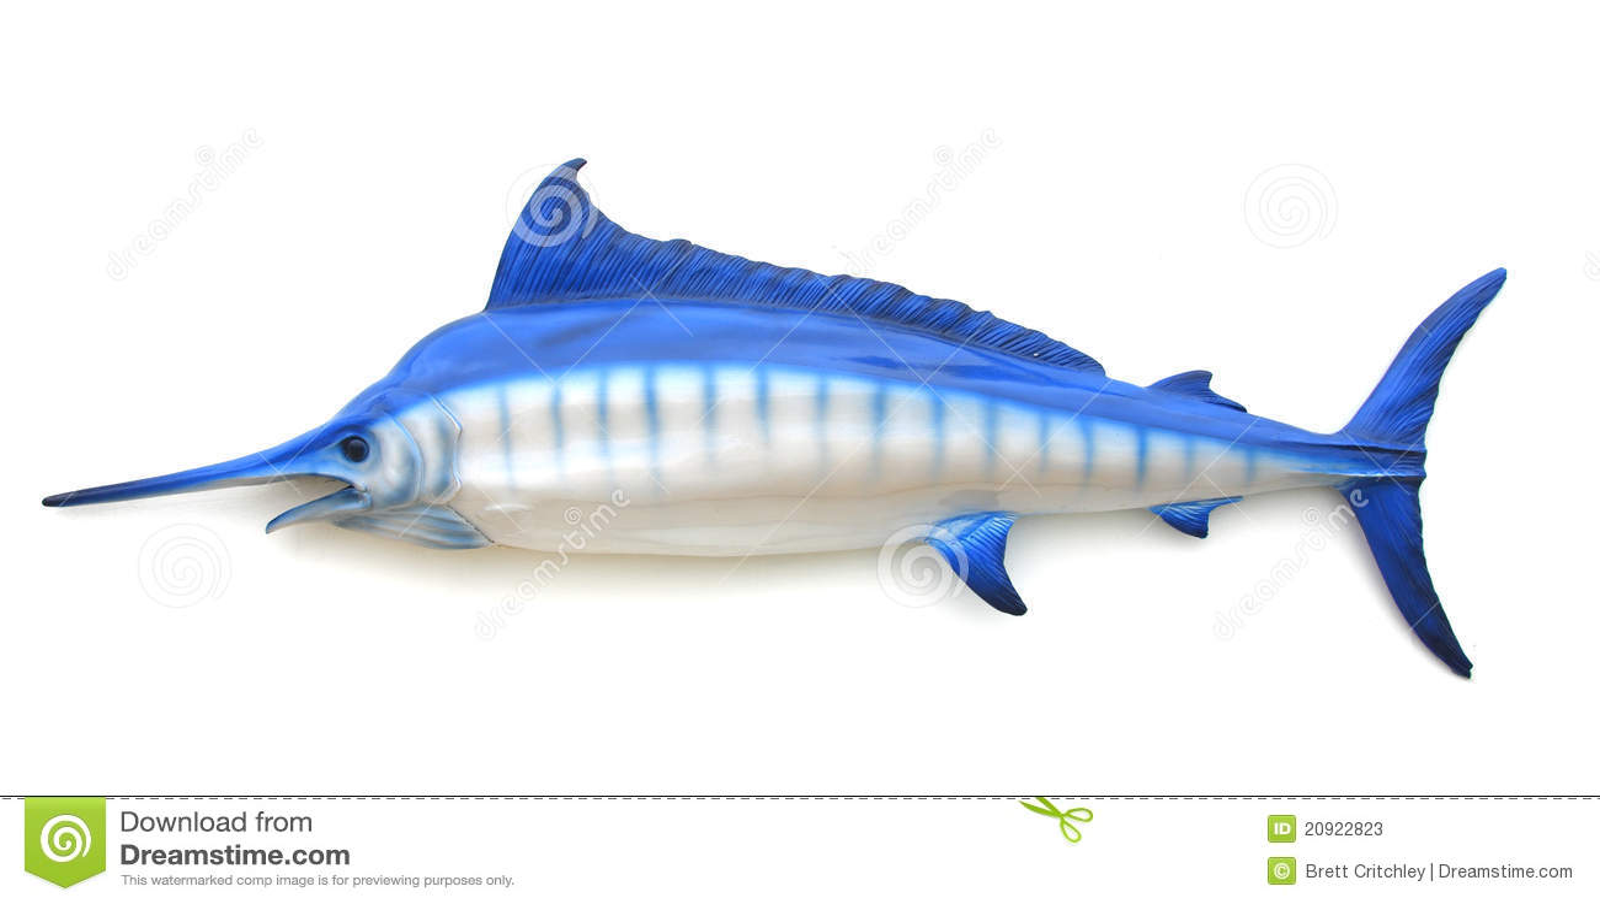 Blue Swordfish Stock Photos - Image: 20922823